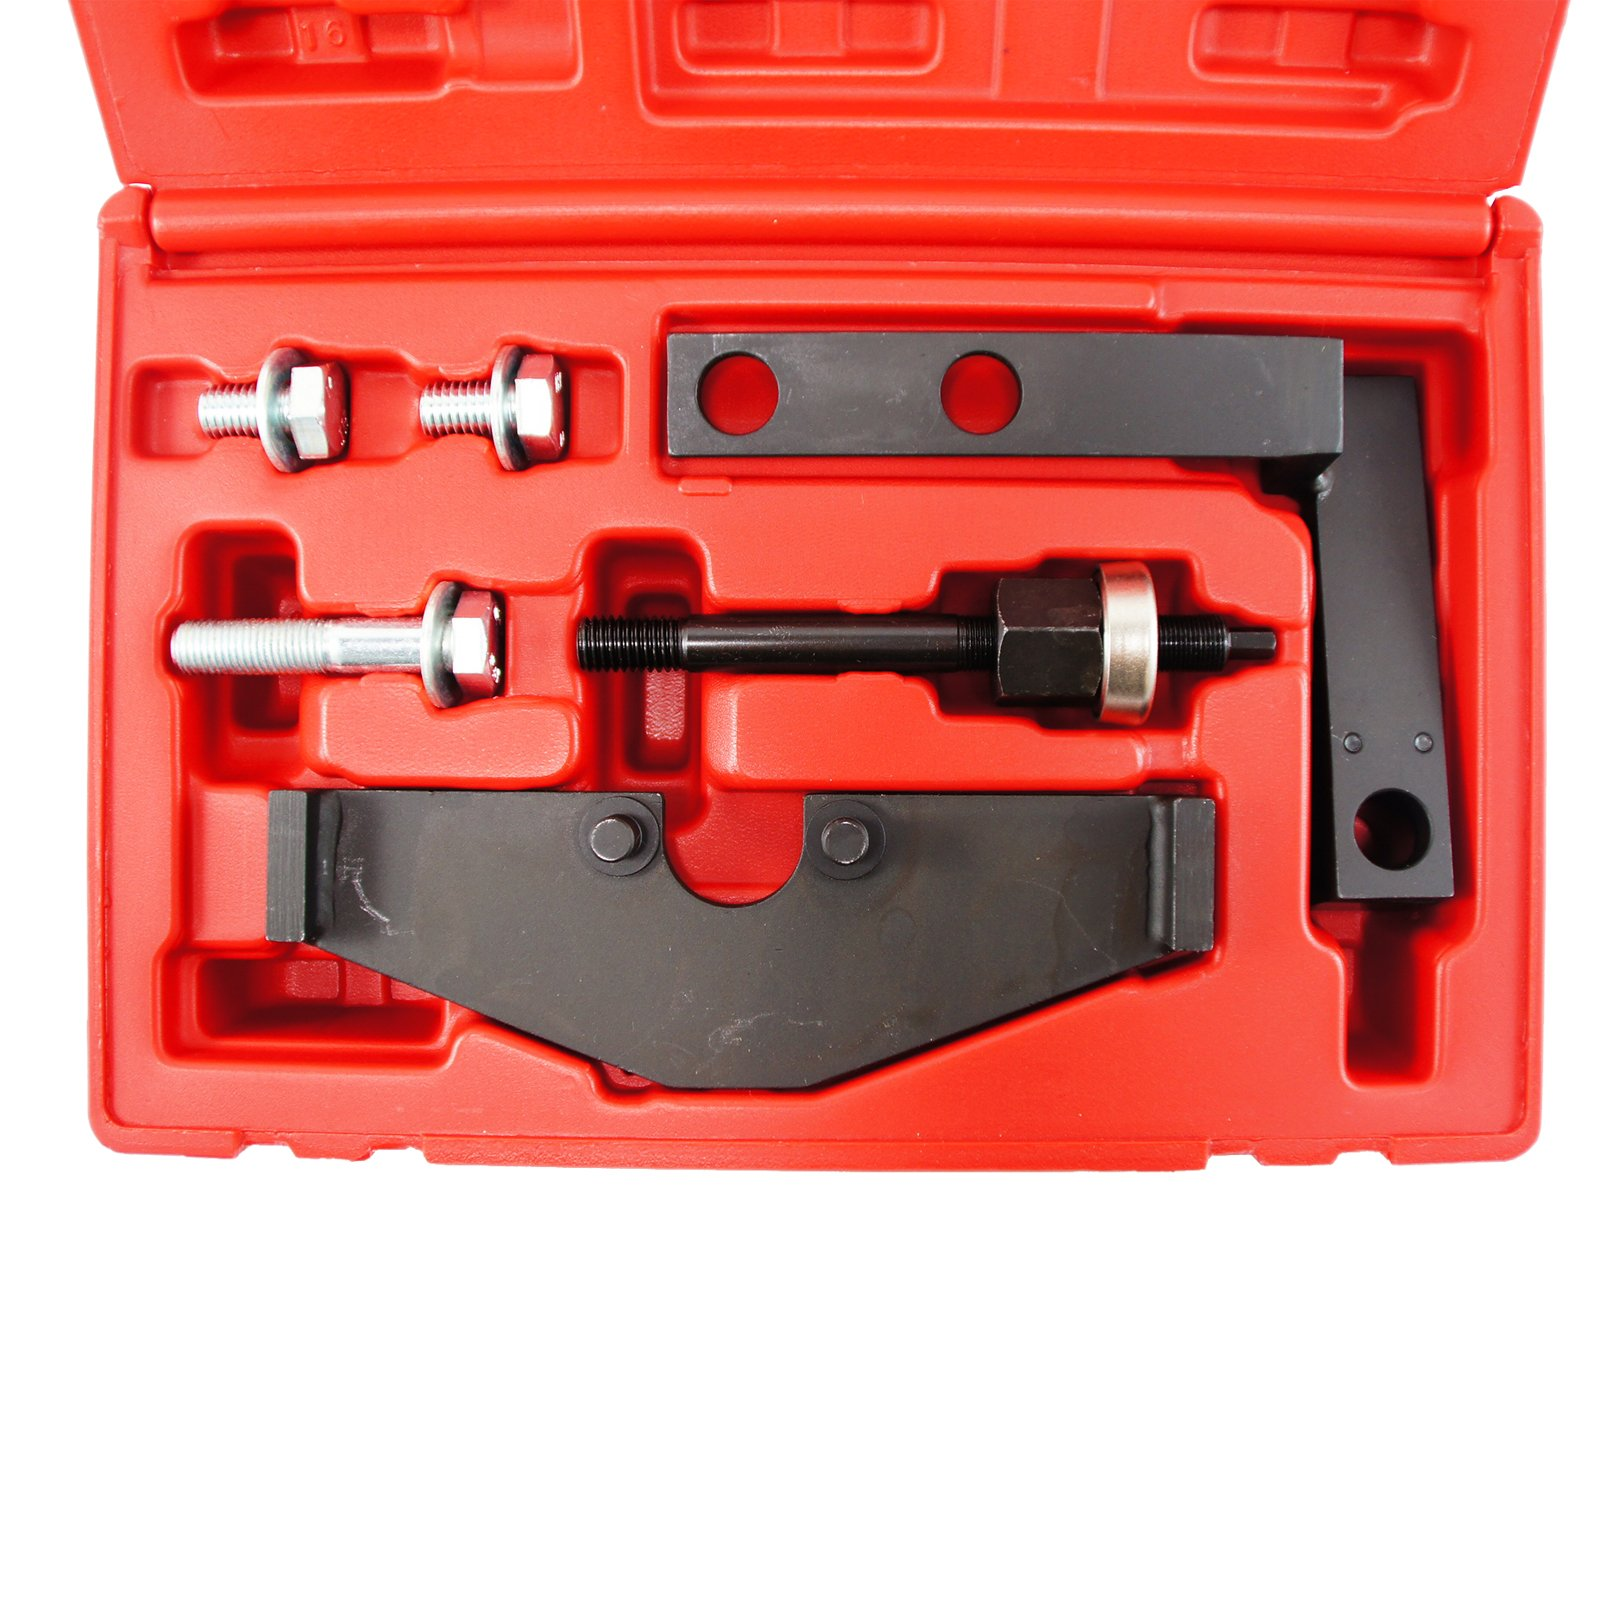 EWK Mini Cooper Bmw W10 W11 V16 Engine Timing Camshaft Cam Locking Tool 2001-2006